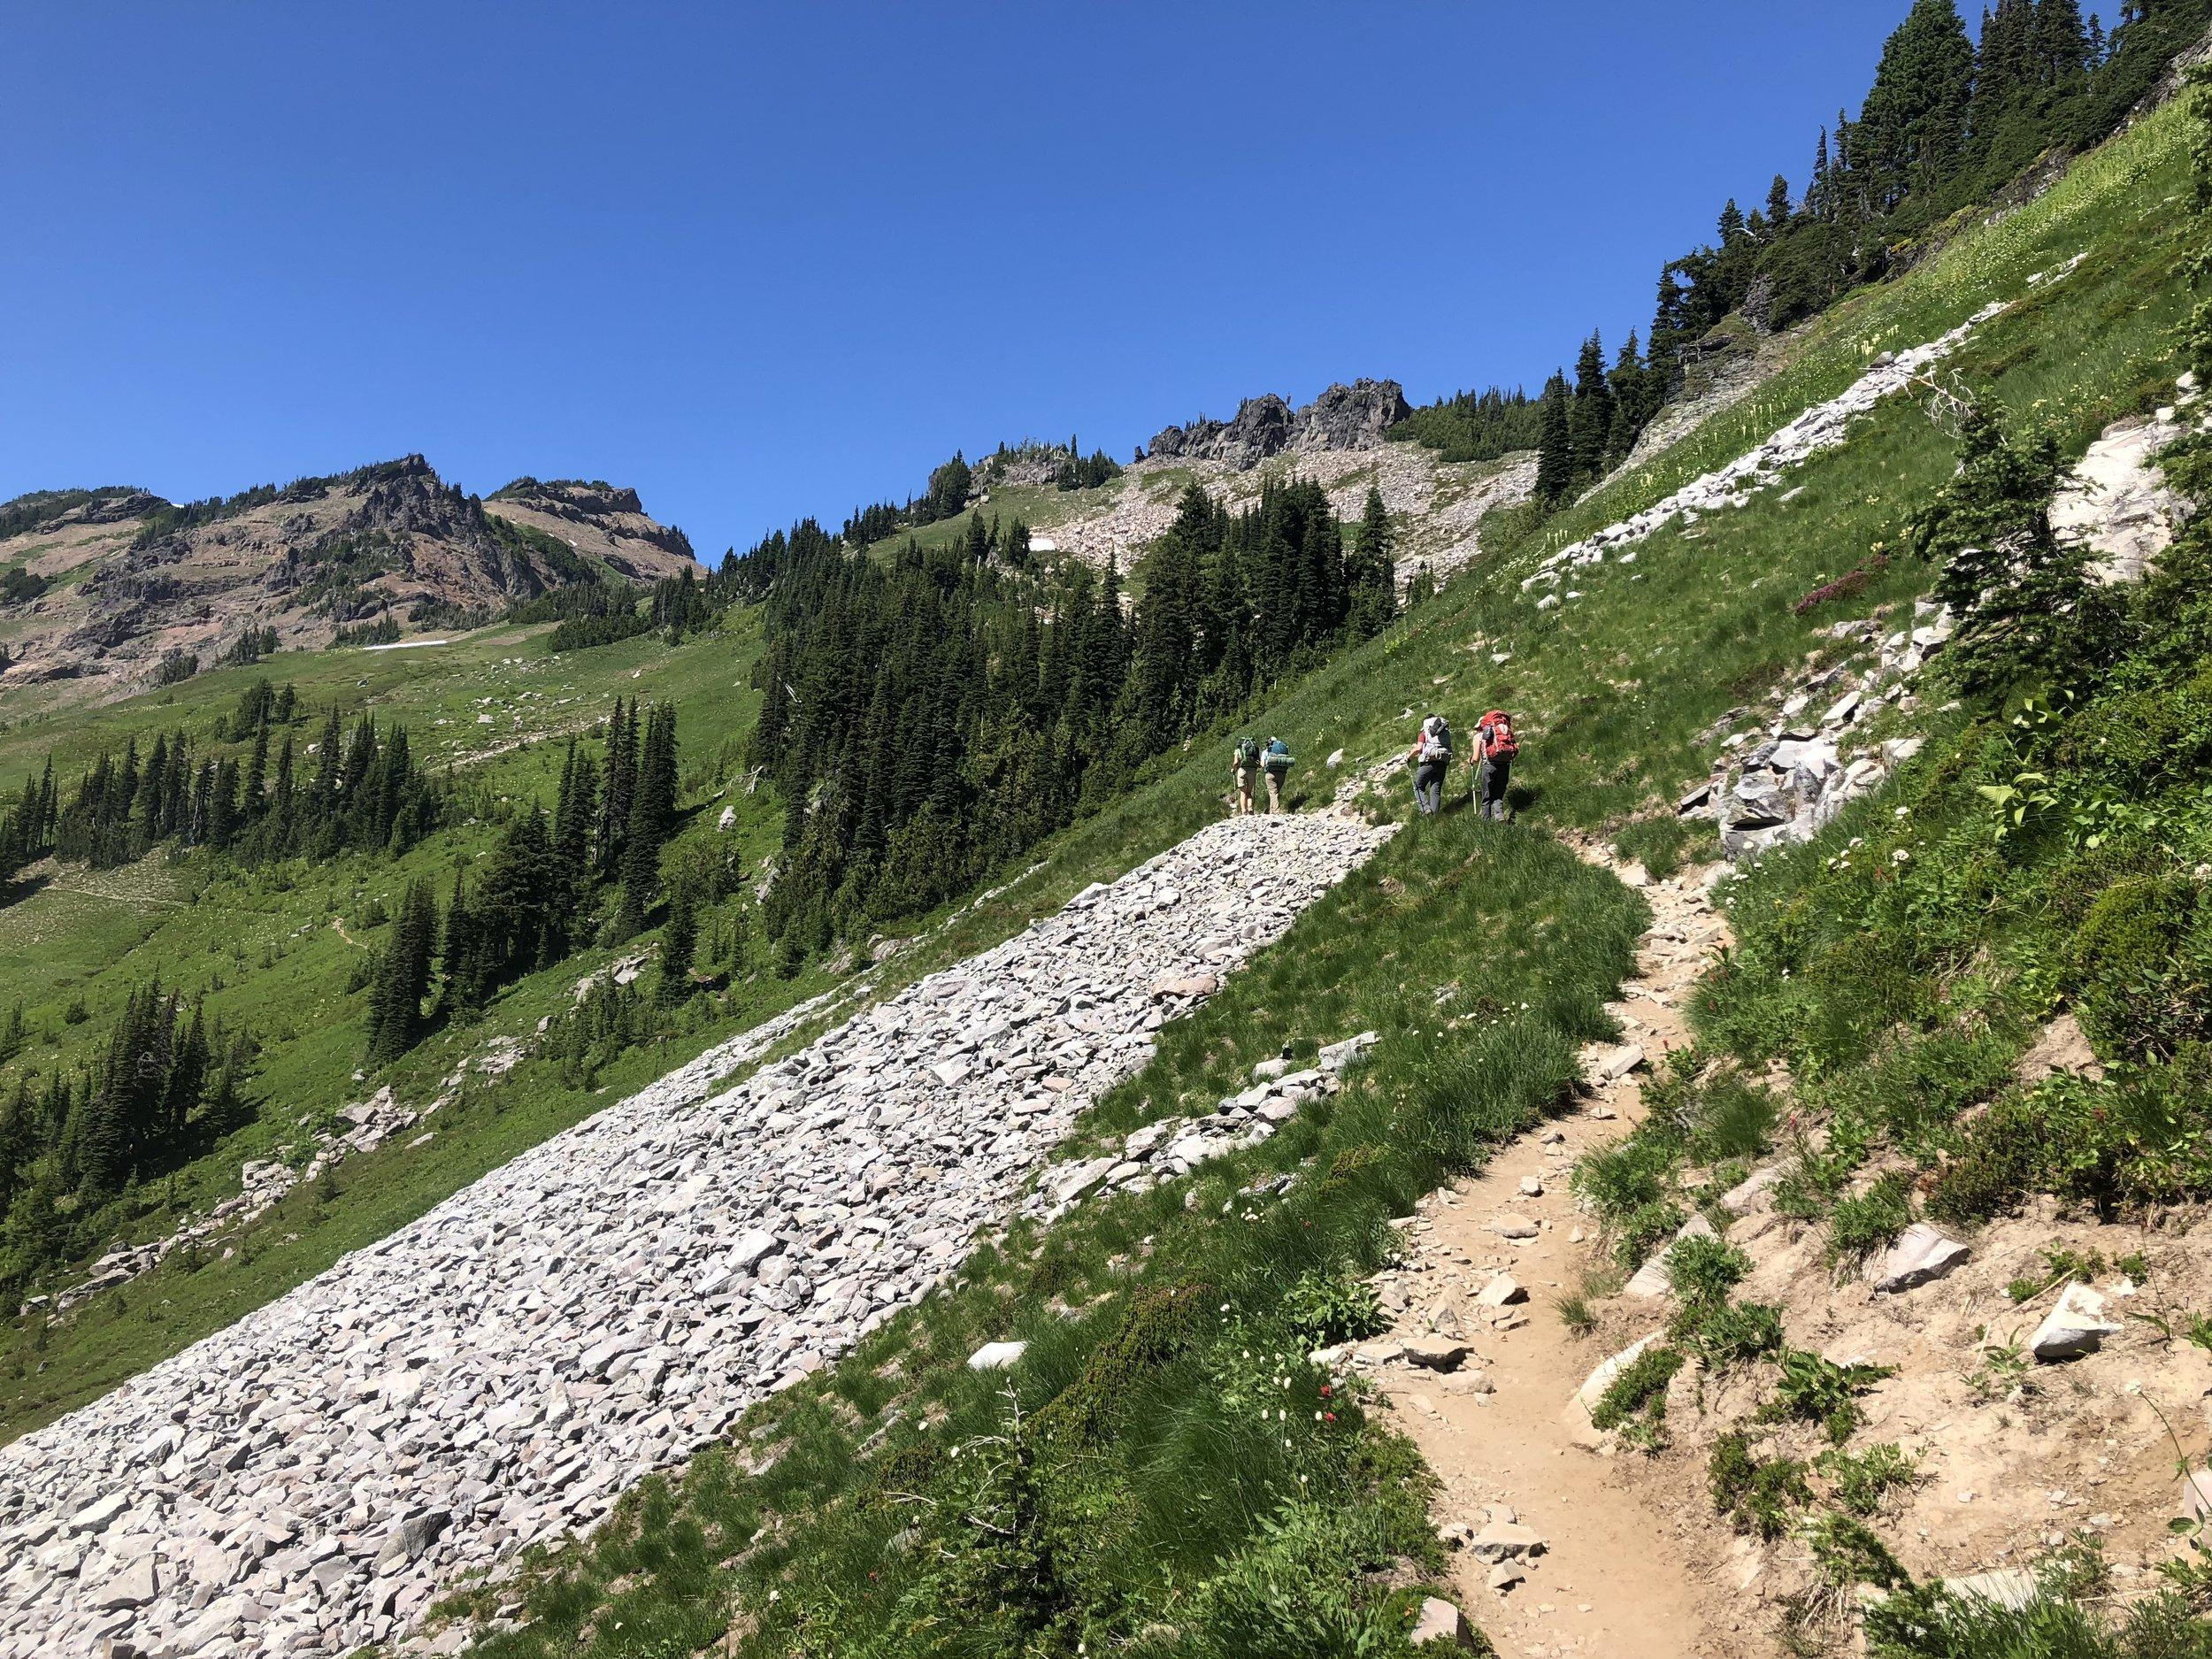 The trail approaching Goat Lake